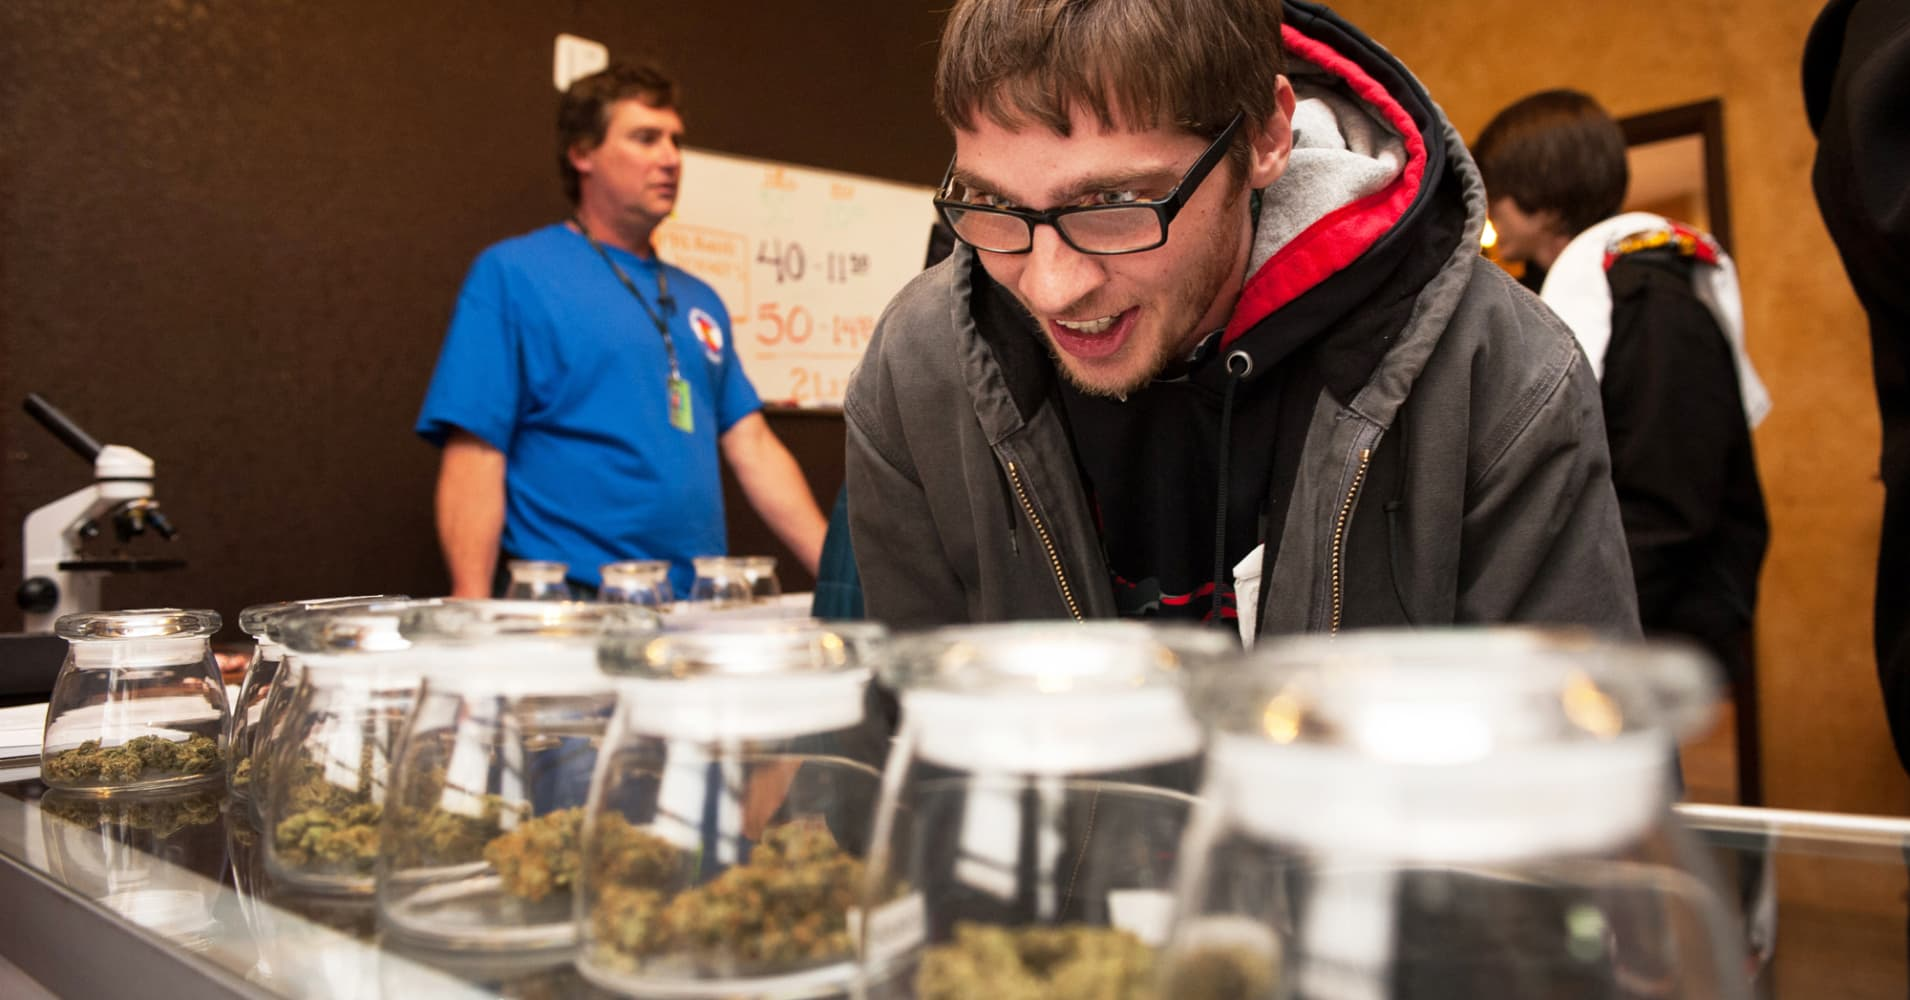 Colorado legal pot industry sales grew 3 percent in 2018, top $6 billion since recreational use began